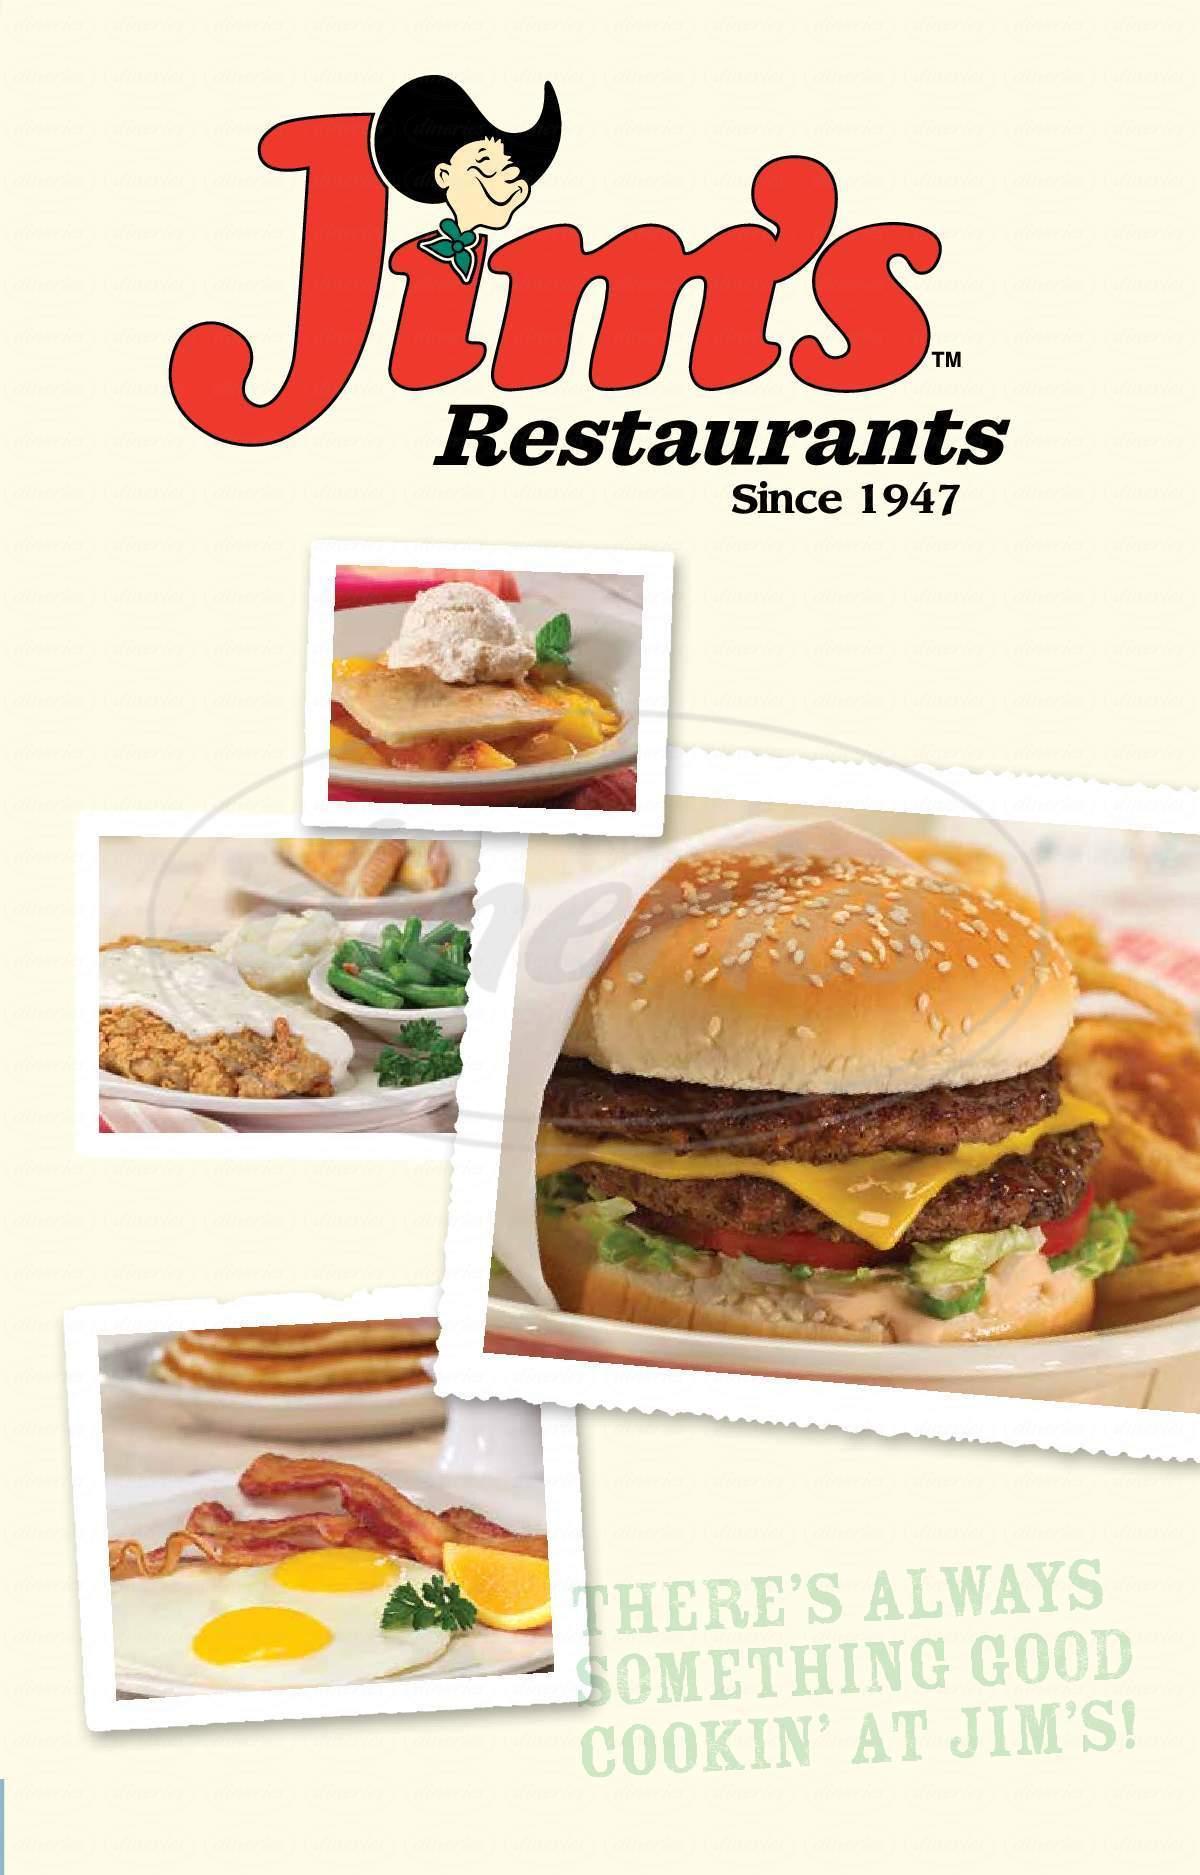 menu for Jim's Restaurants